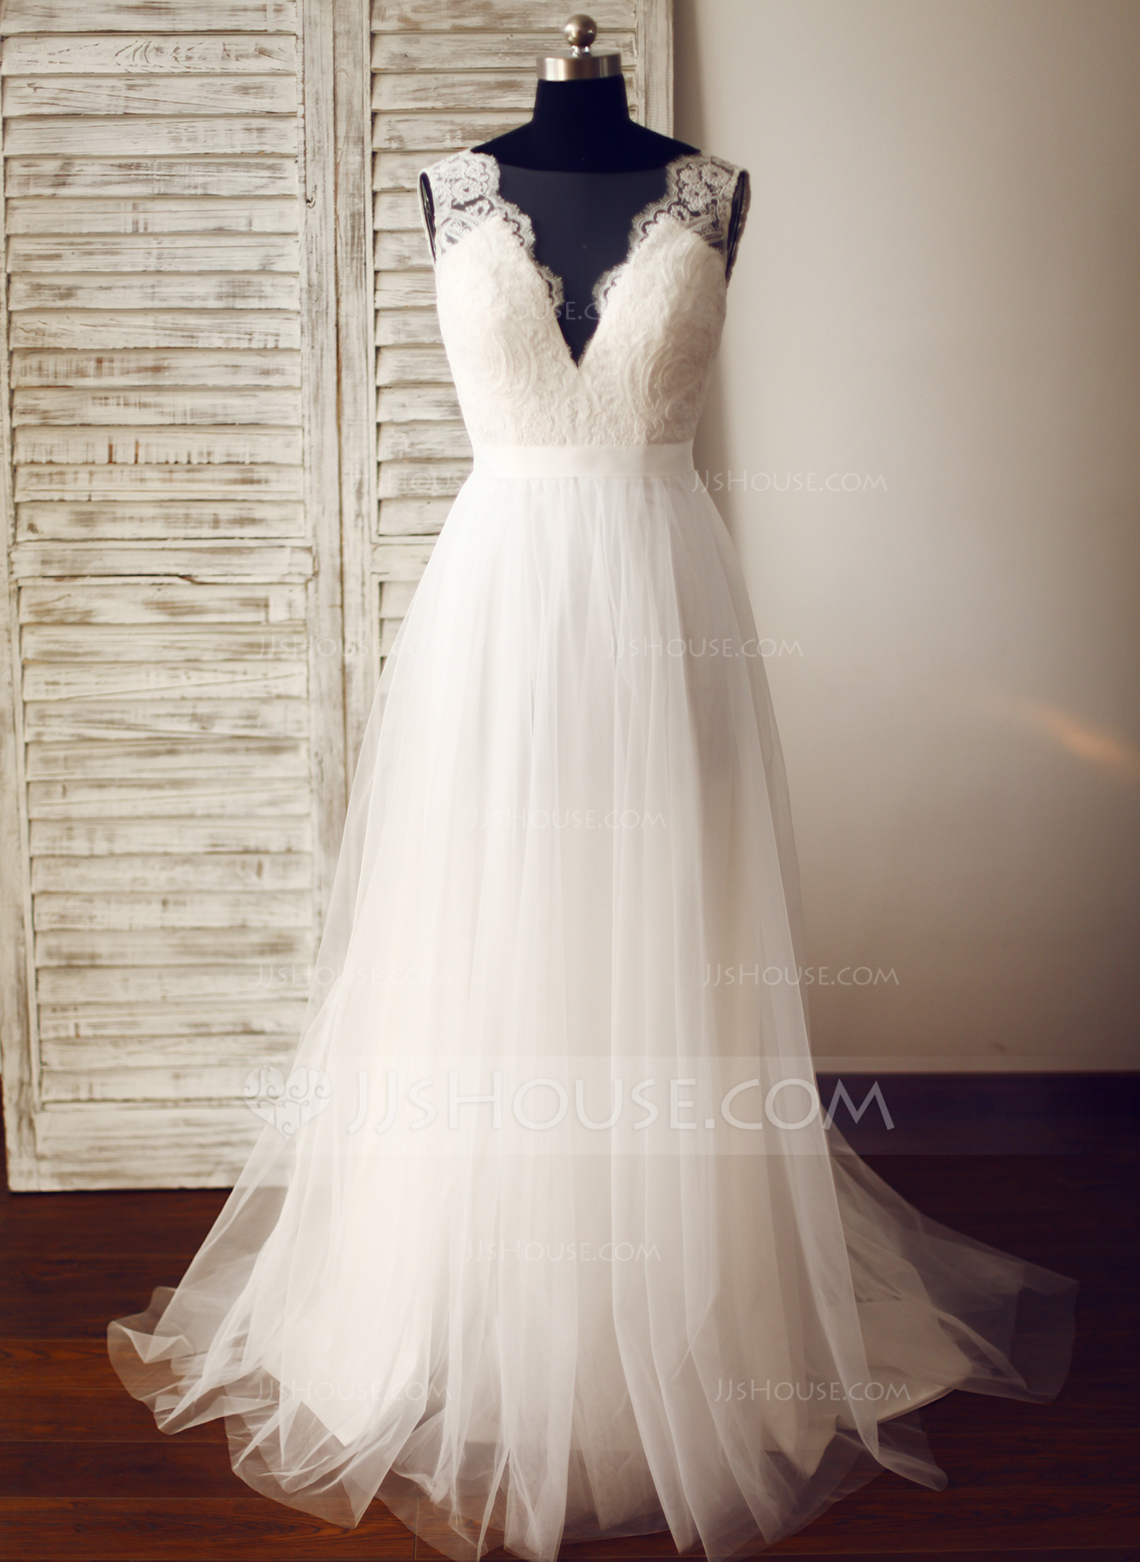 wedding dresses with train photo - 1